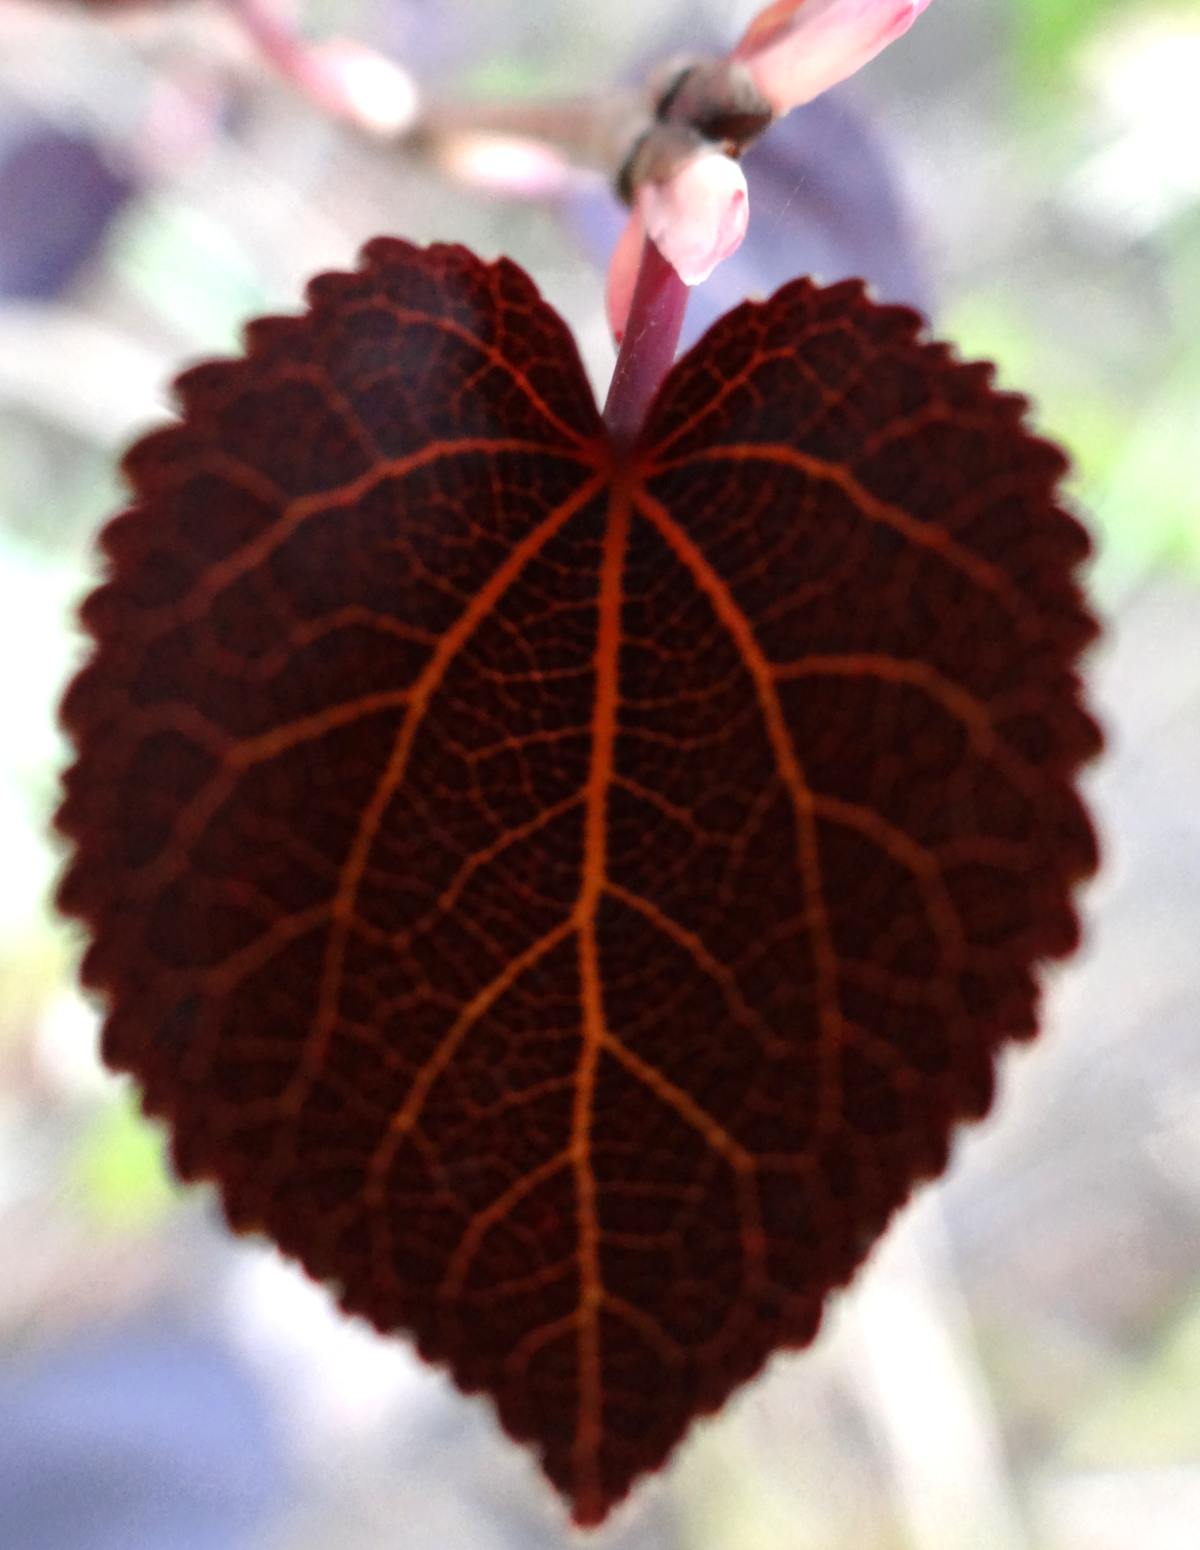 Katsura tree varieties, magnificent and weeping